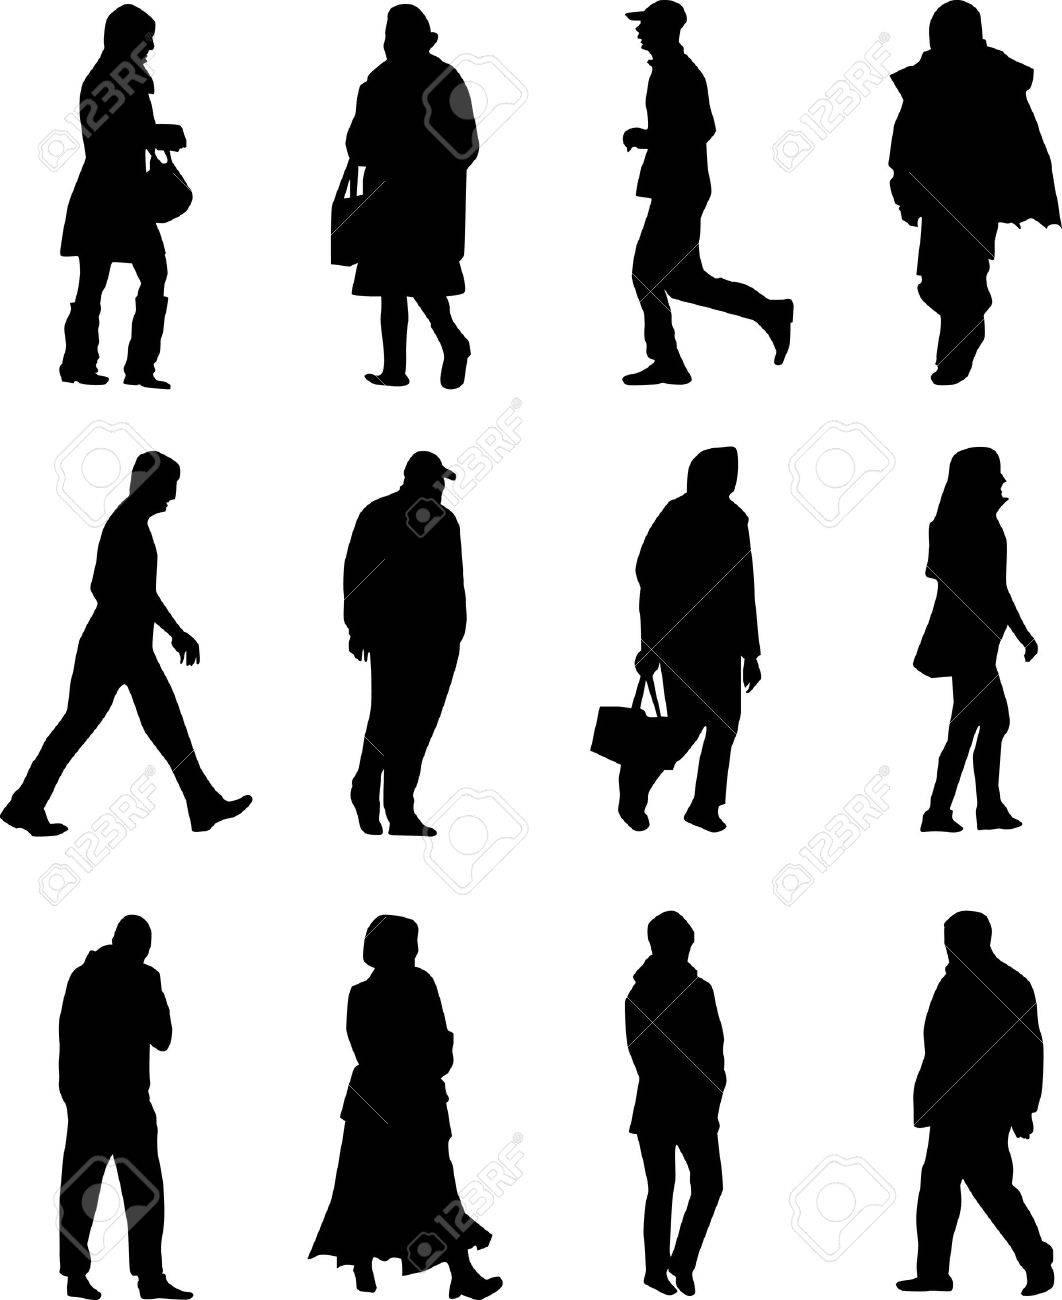 People Walking Silhouette Vector Stock